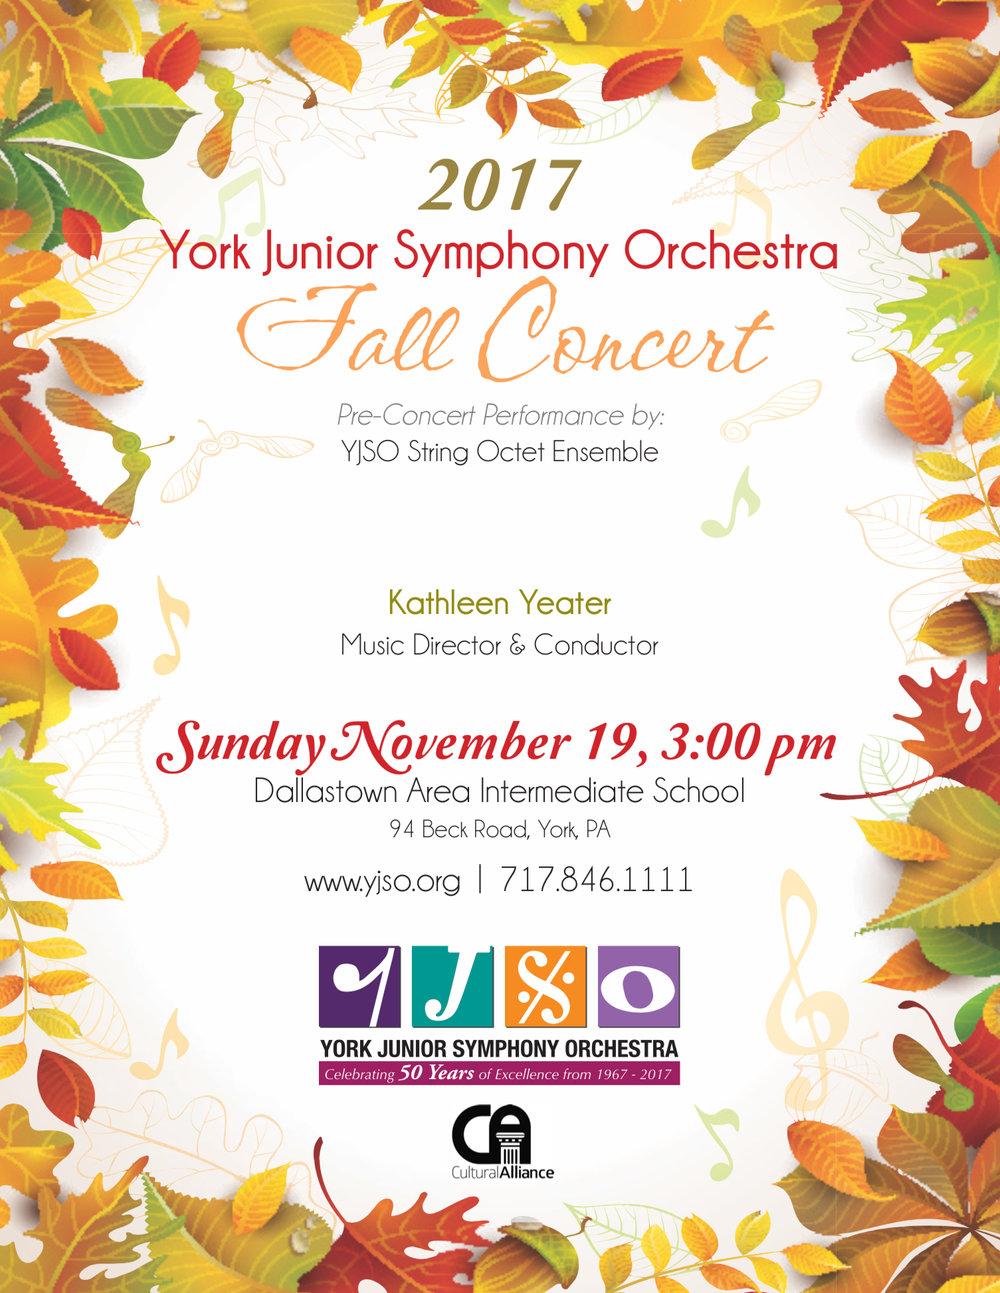 YJSO_Fall_Concert_2017.jpg